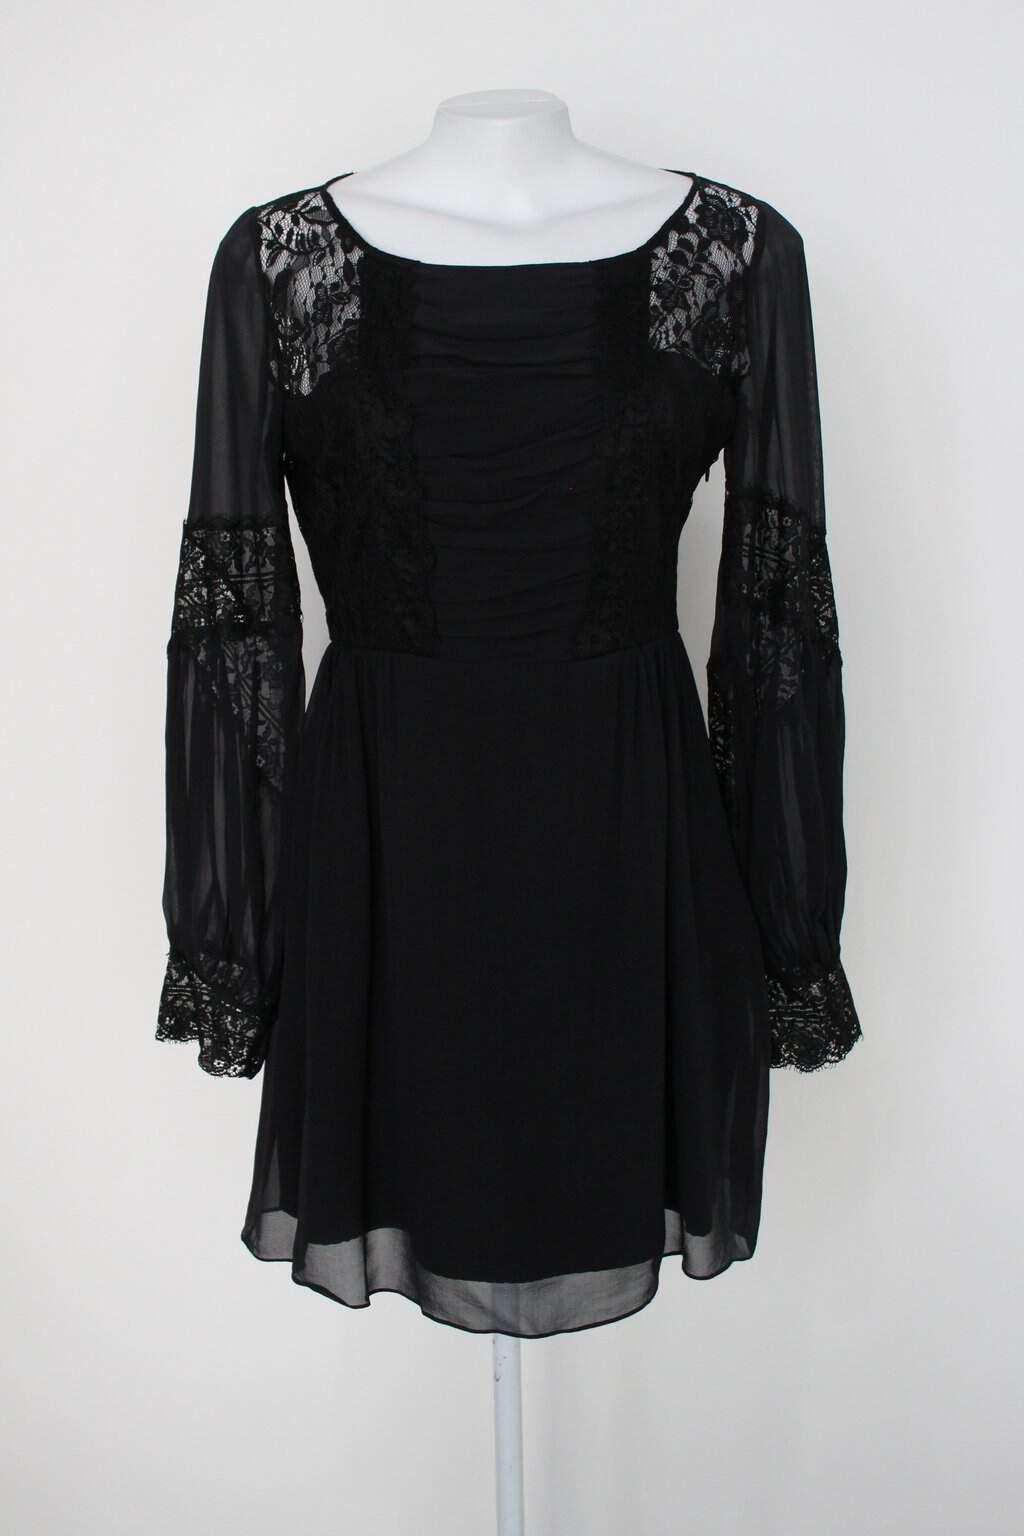 Vestido Iorane Feminino Preto Com Renda